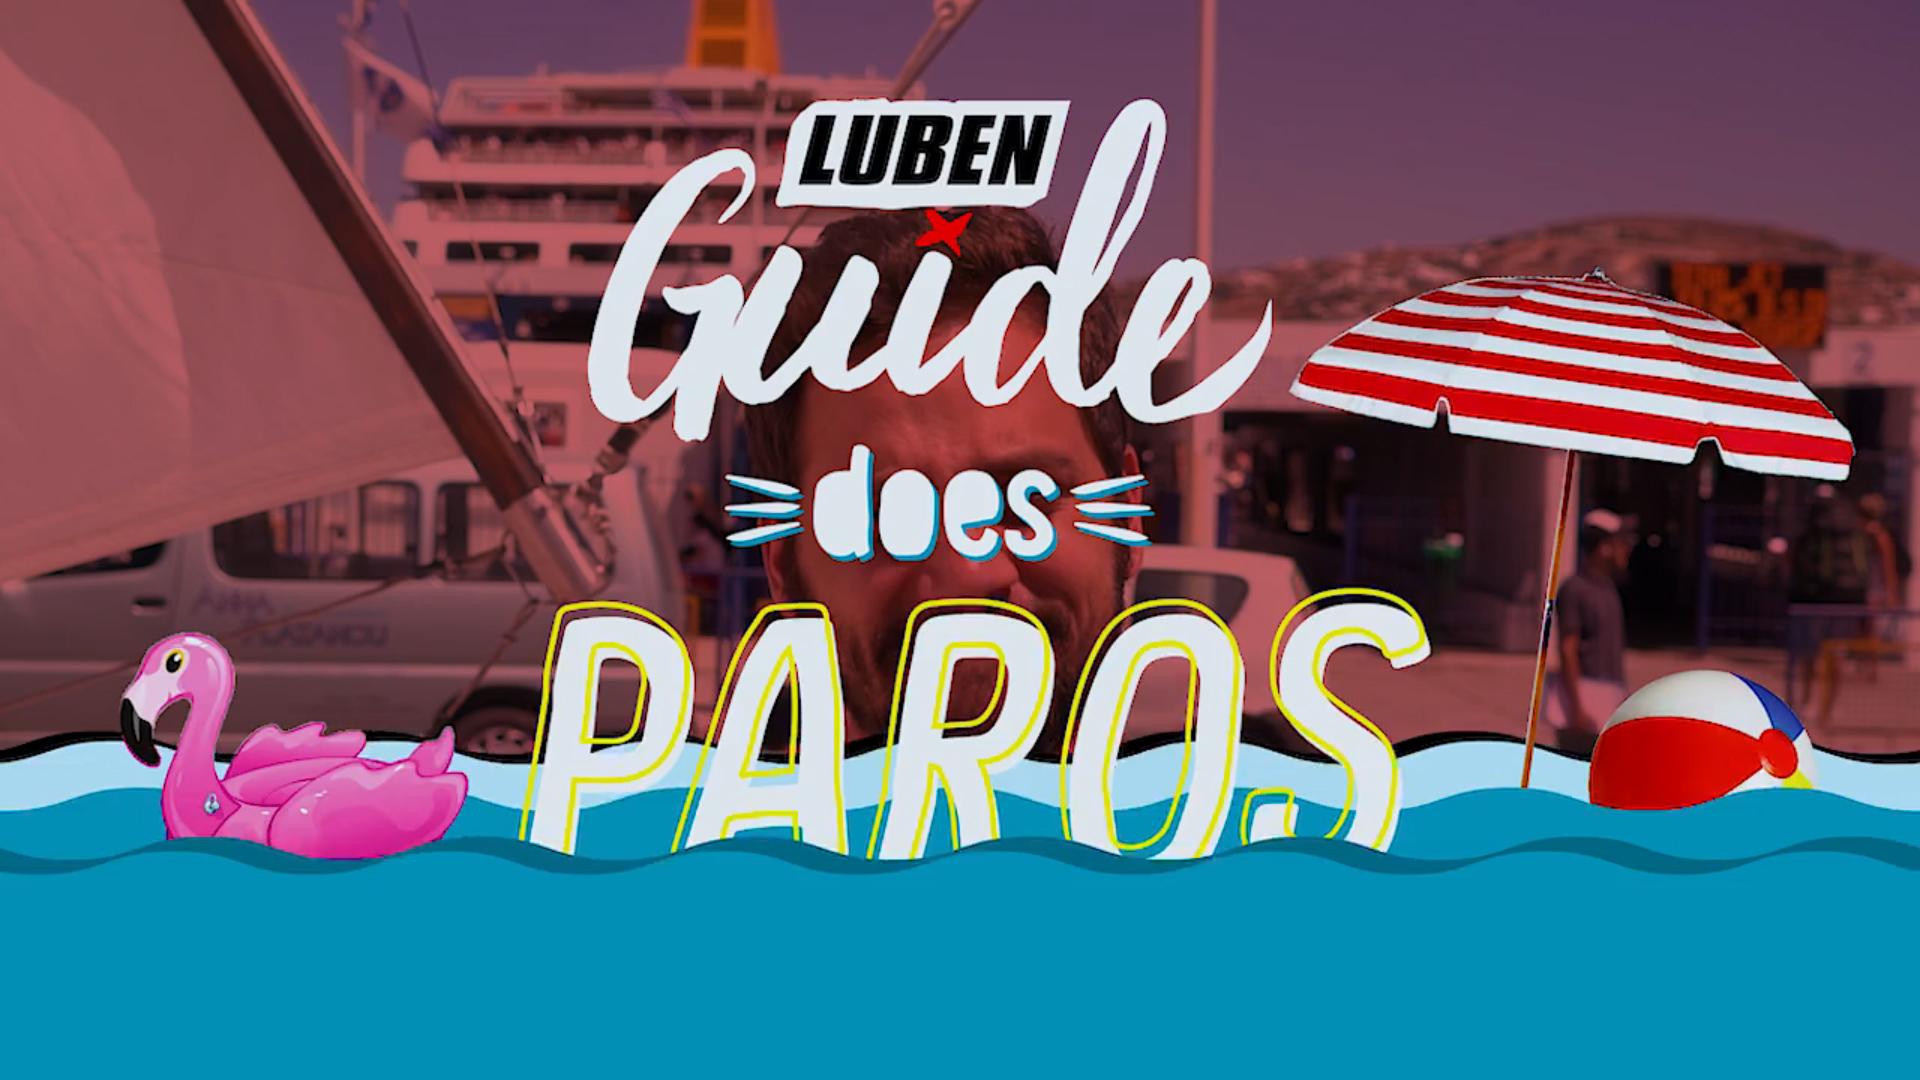 Luben Guide does Paros!